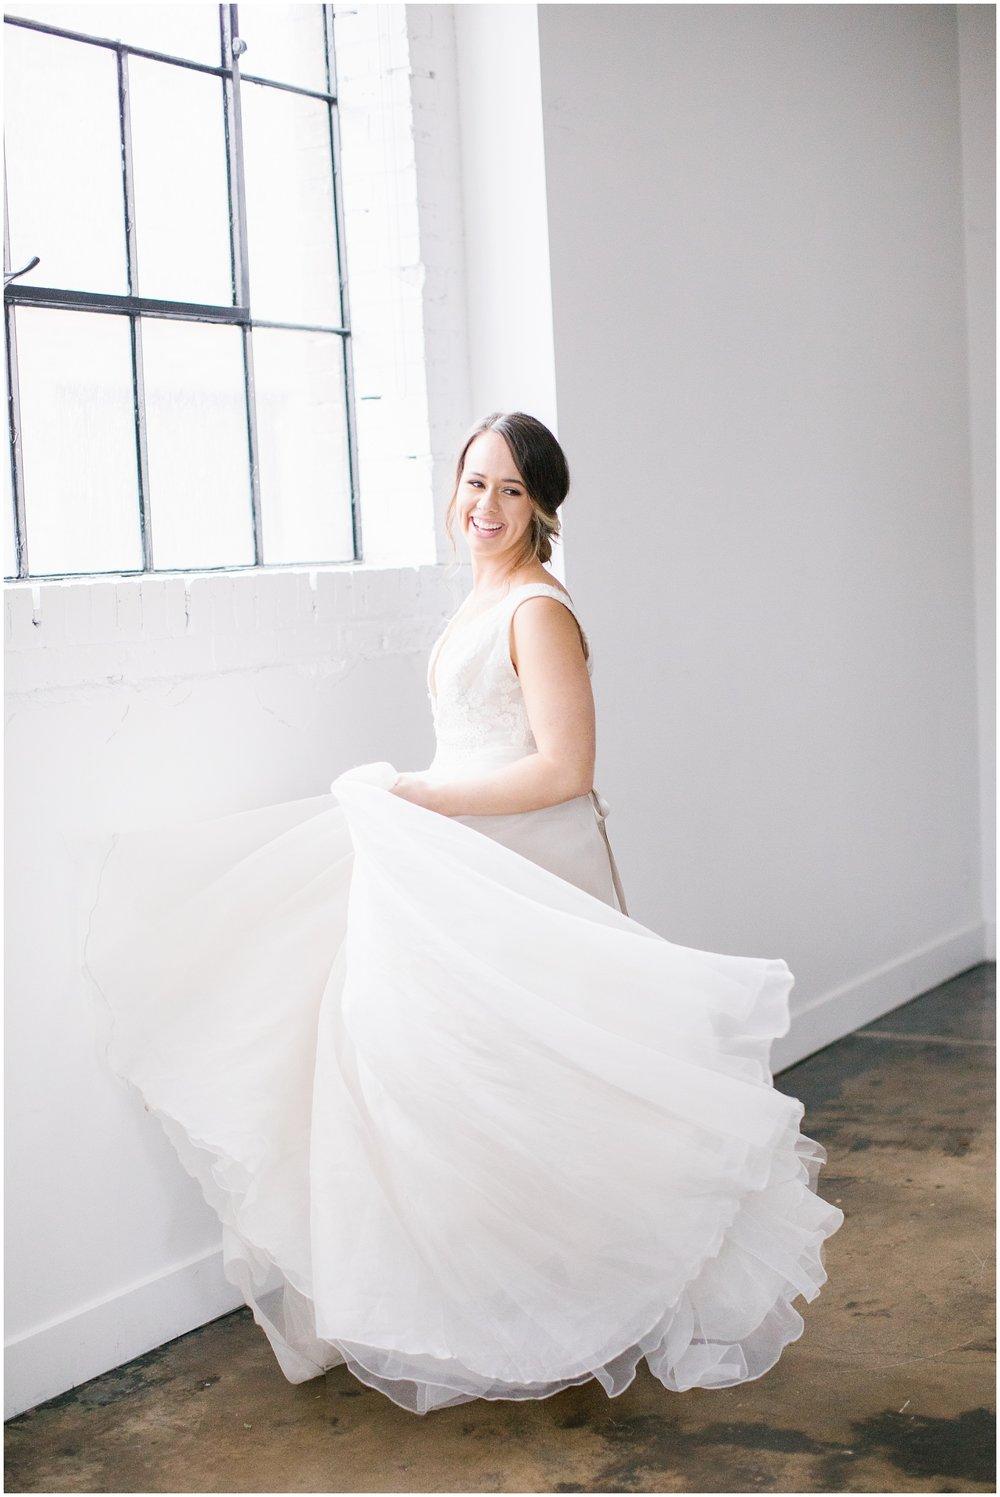 Styled Shoot2-17-43_Lizzie-B-Imagery-Utah-Wedding-Photographer-Park-City-Salt-Lake-City-Charcoal-Loft-Studio.jpg